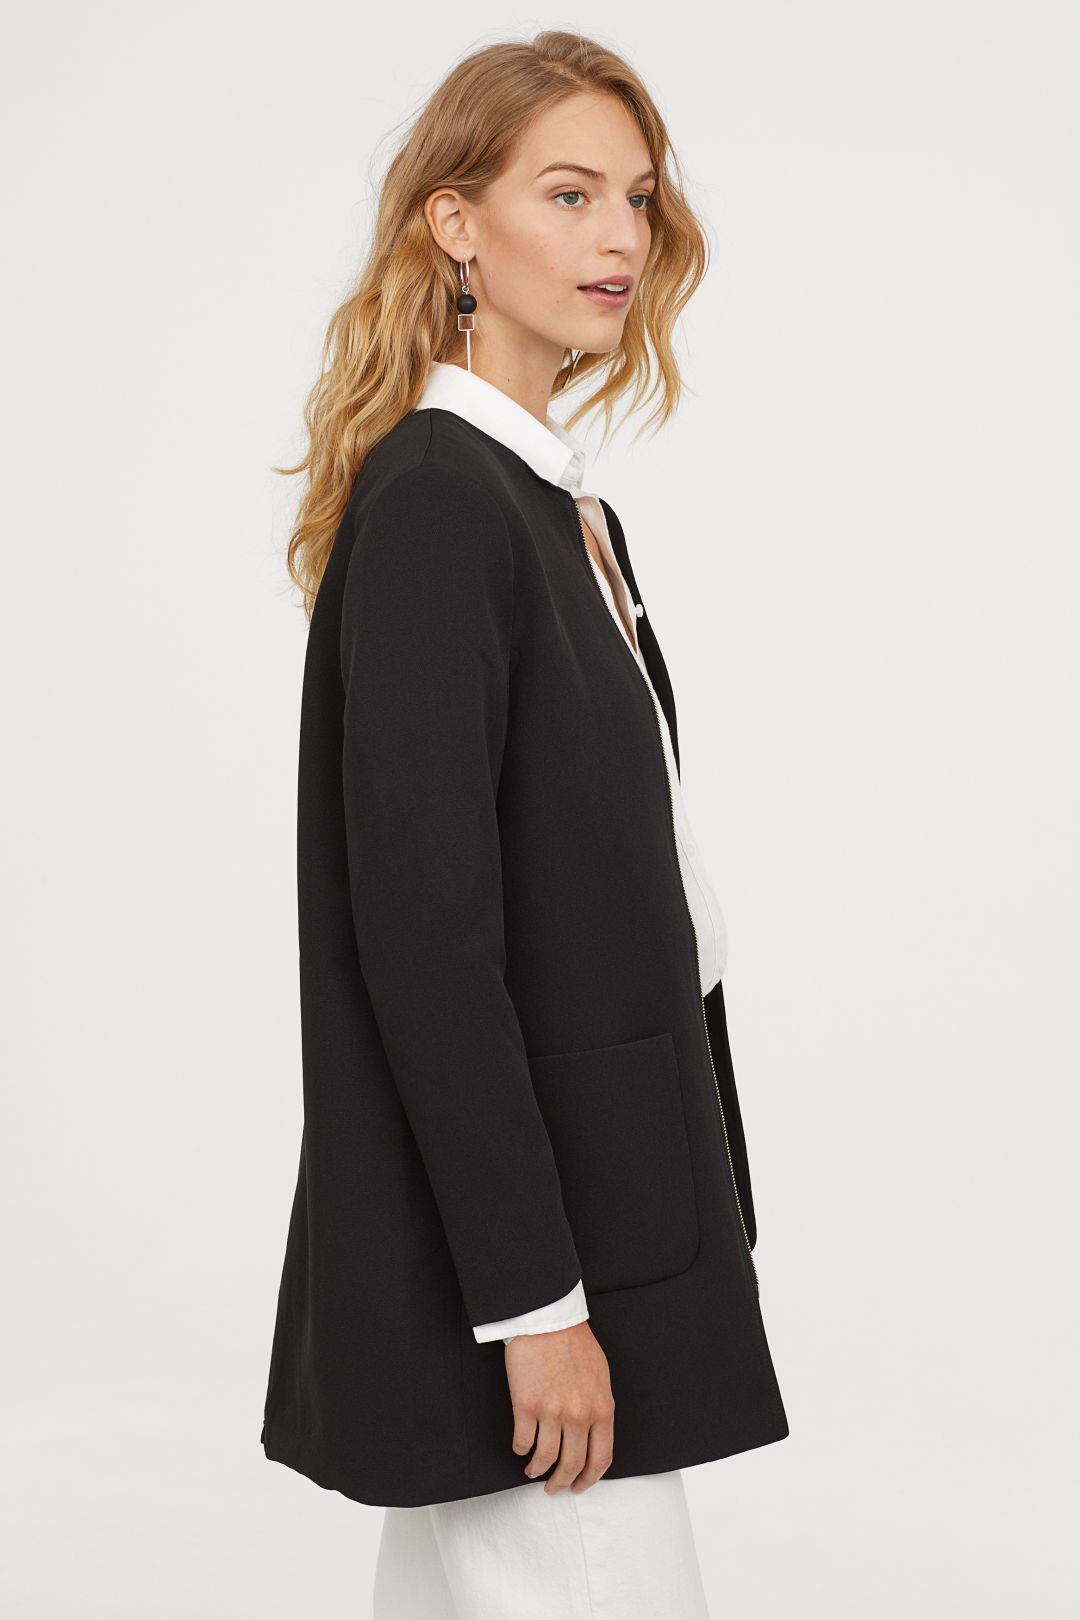 6b246367 Kort kappa | W O R K | Jackets, Coat, Blazer